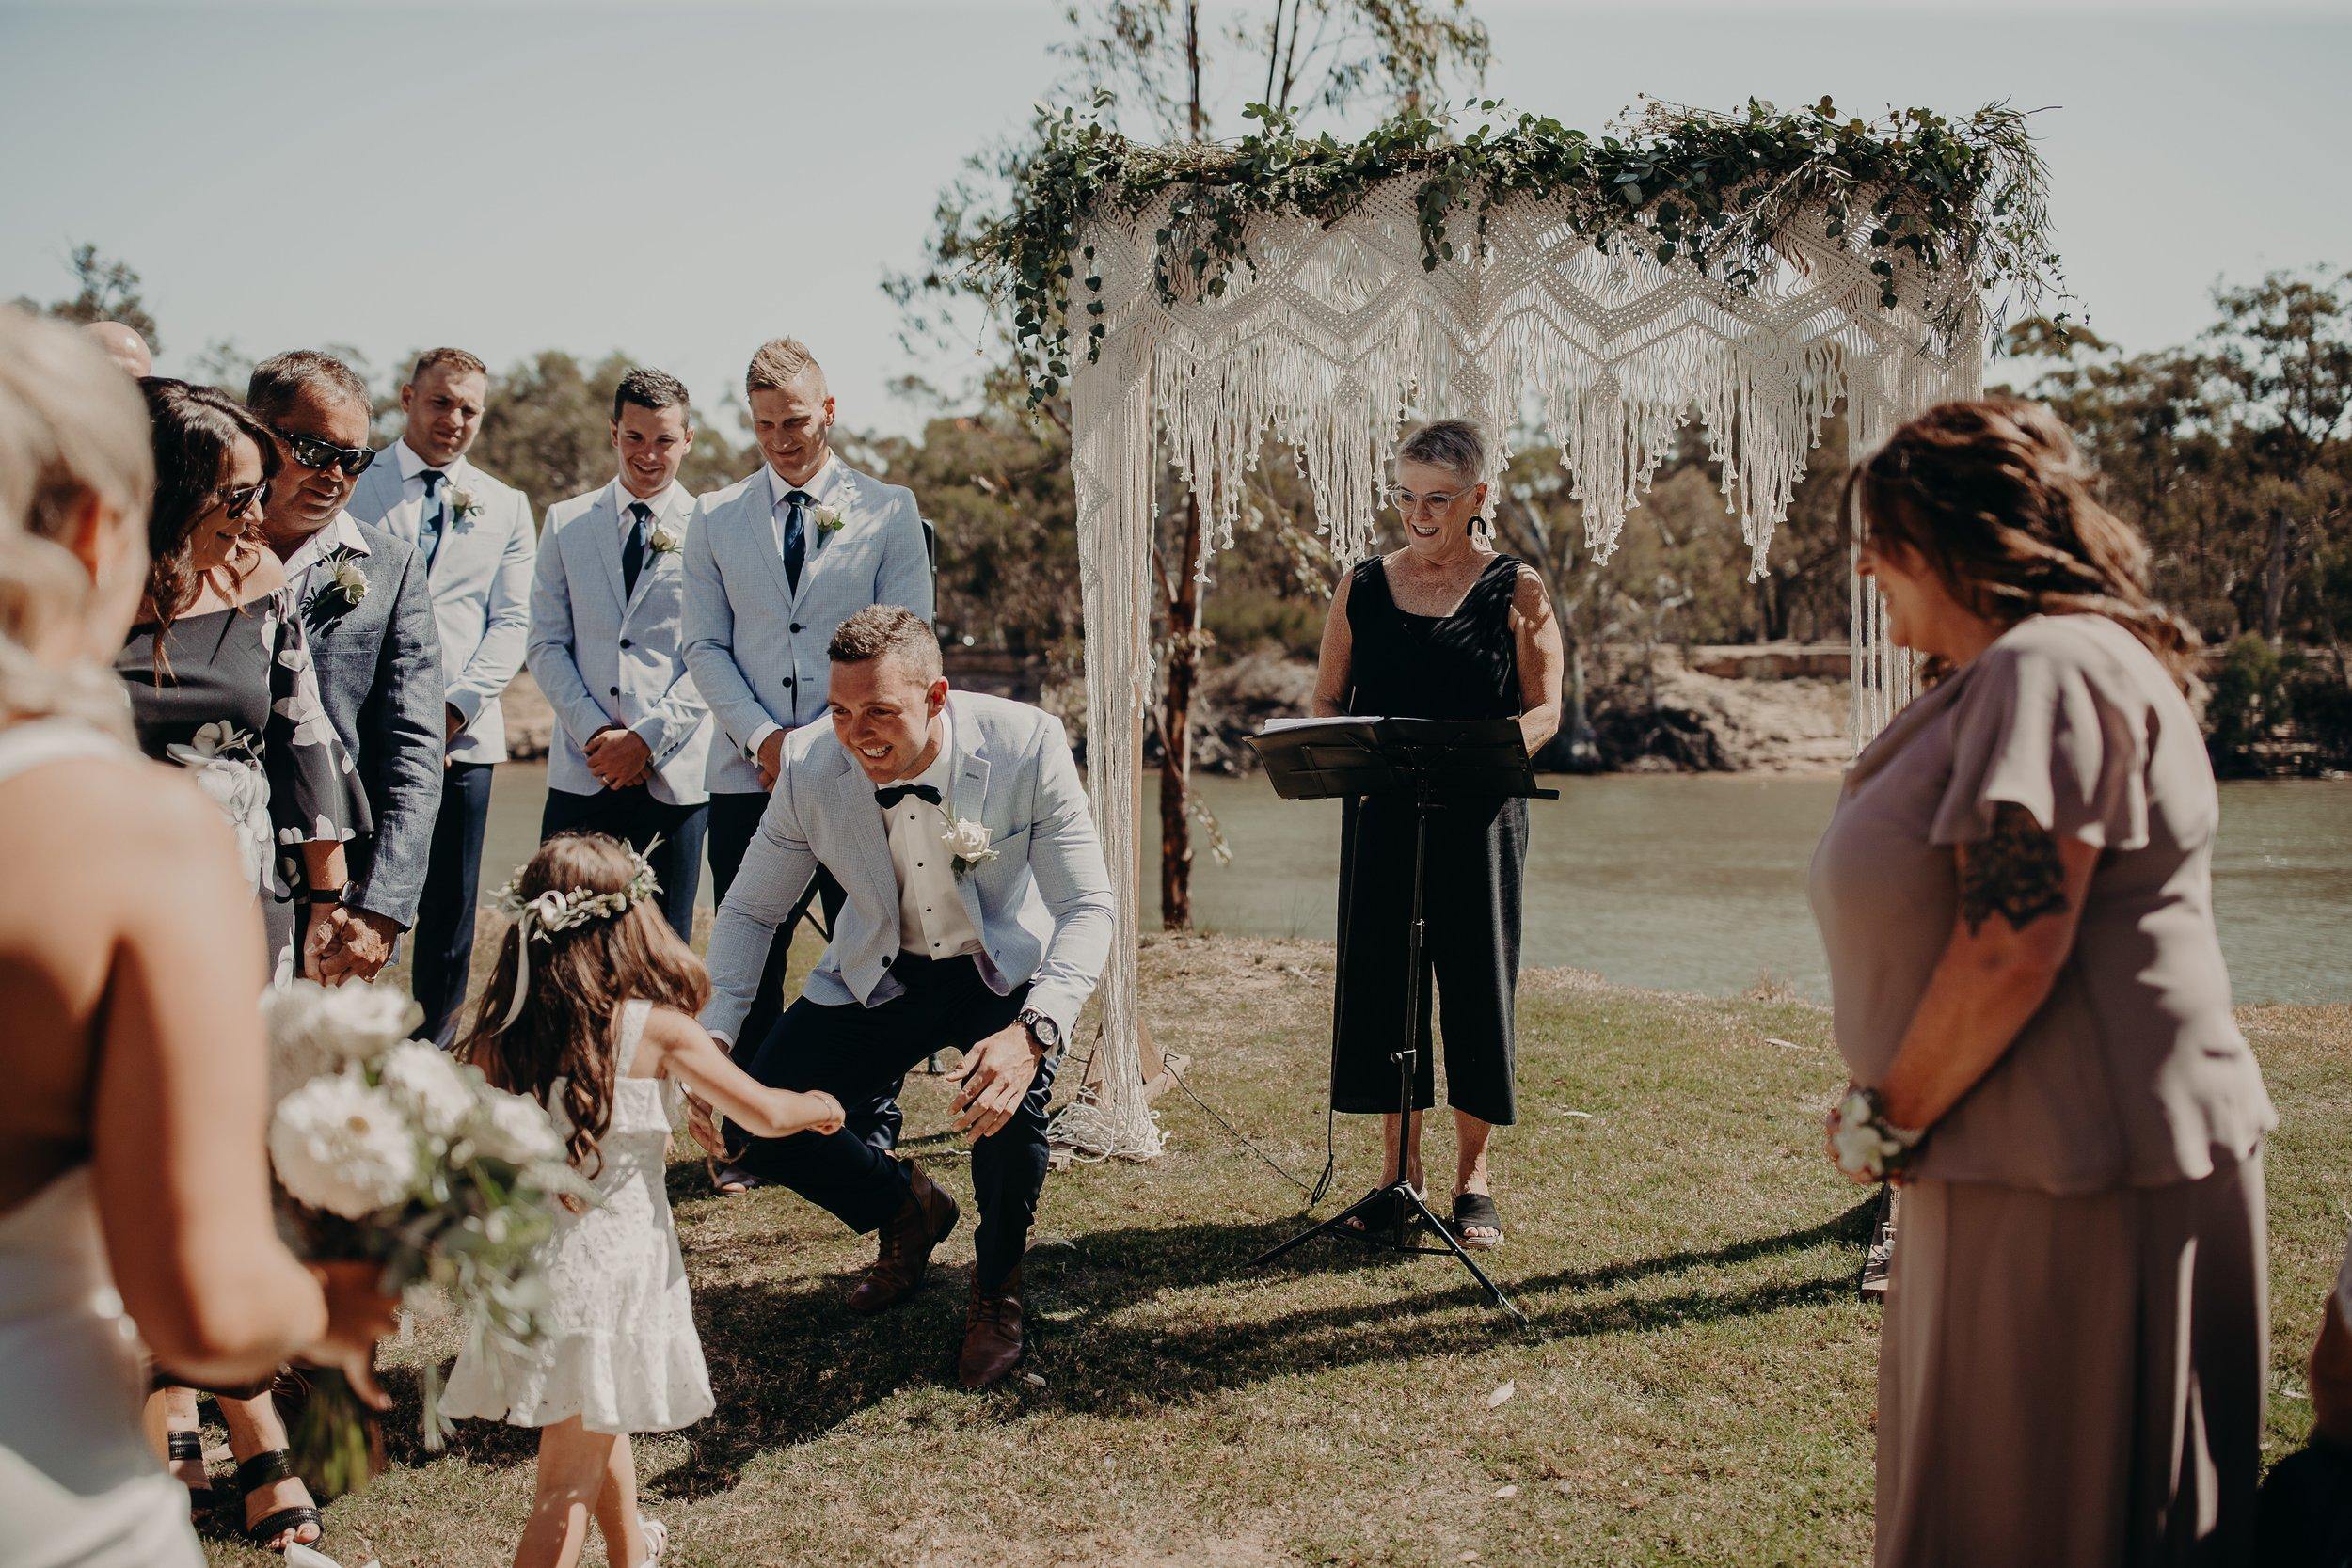 mickalathomas_puremacphotography_weddingphotographer_couplephotographer_Sheppartonphotographer_2864.jpg